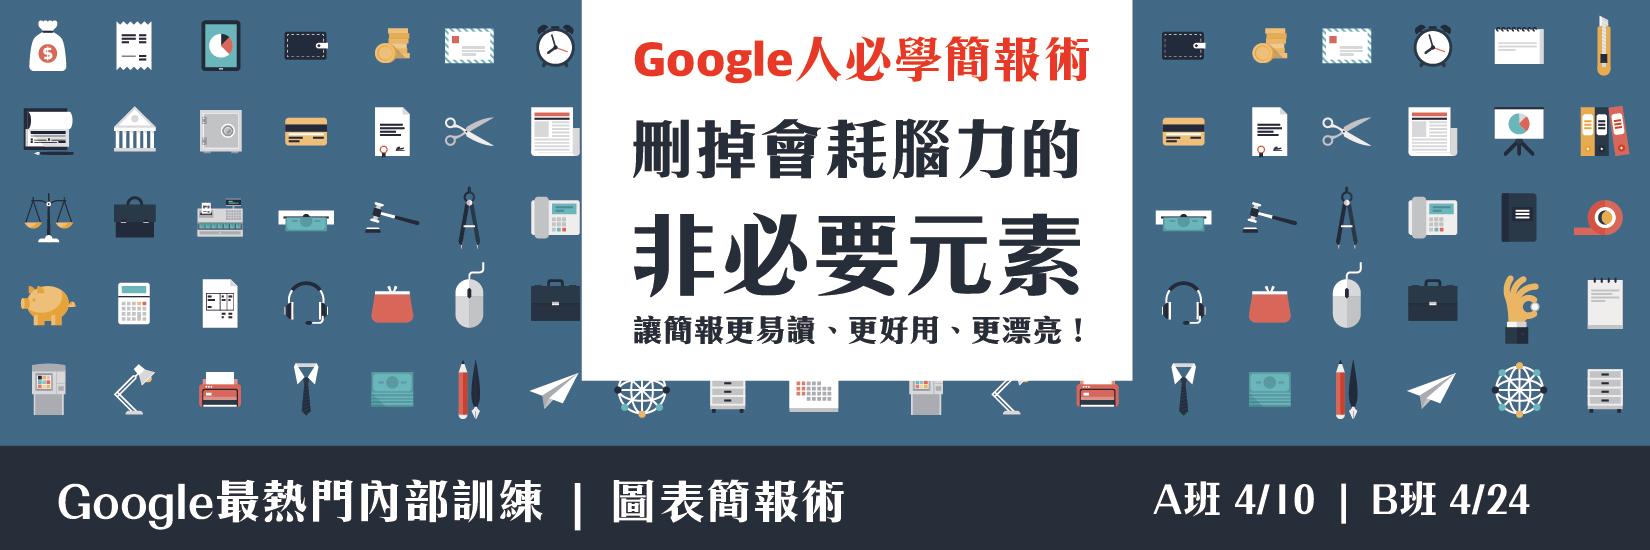 Google圖表簡報術